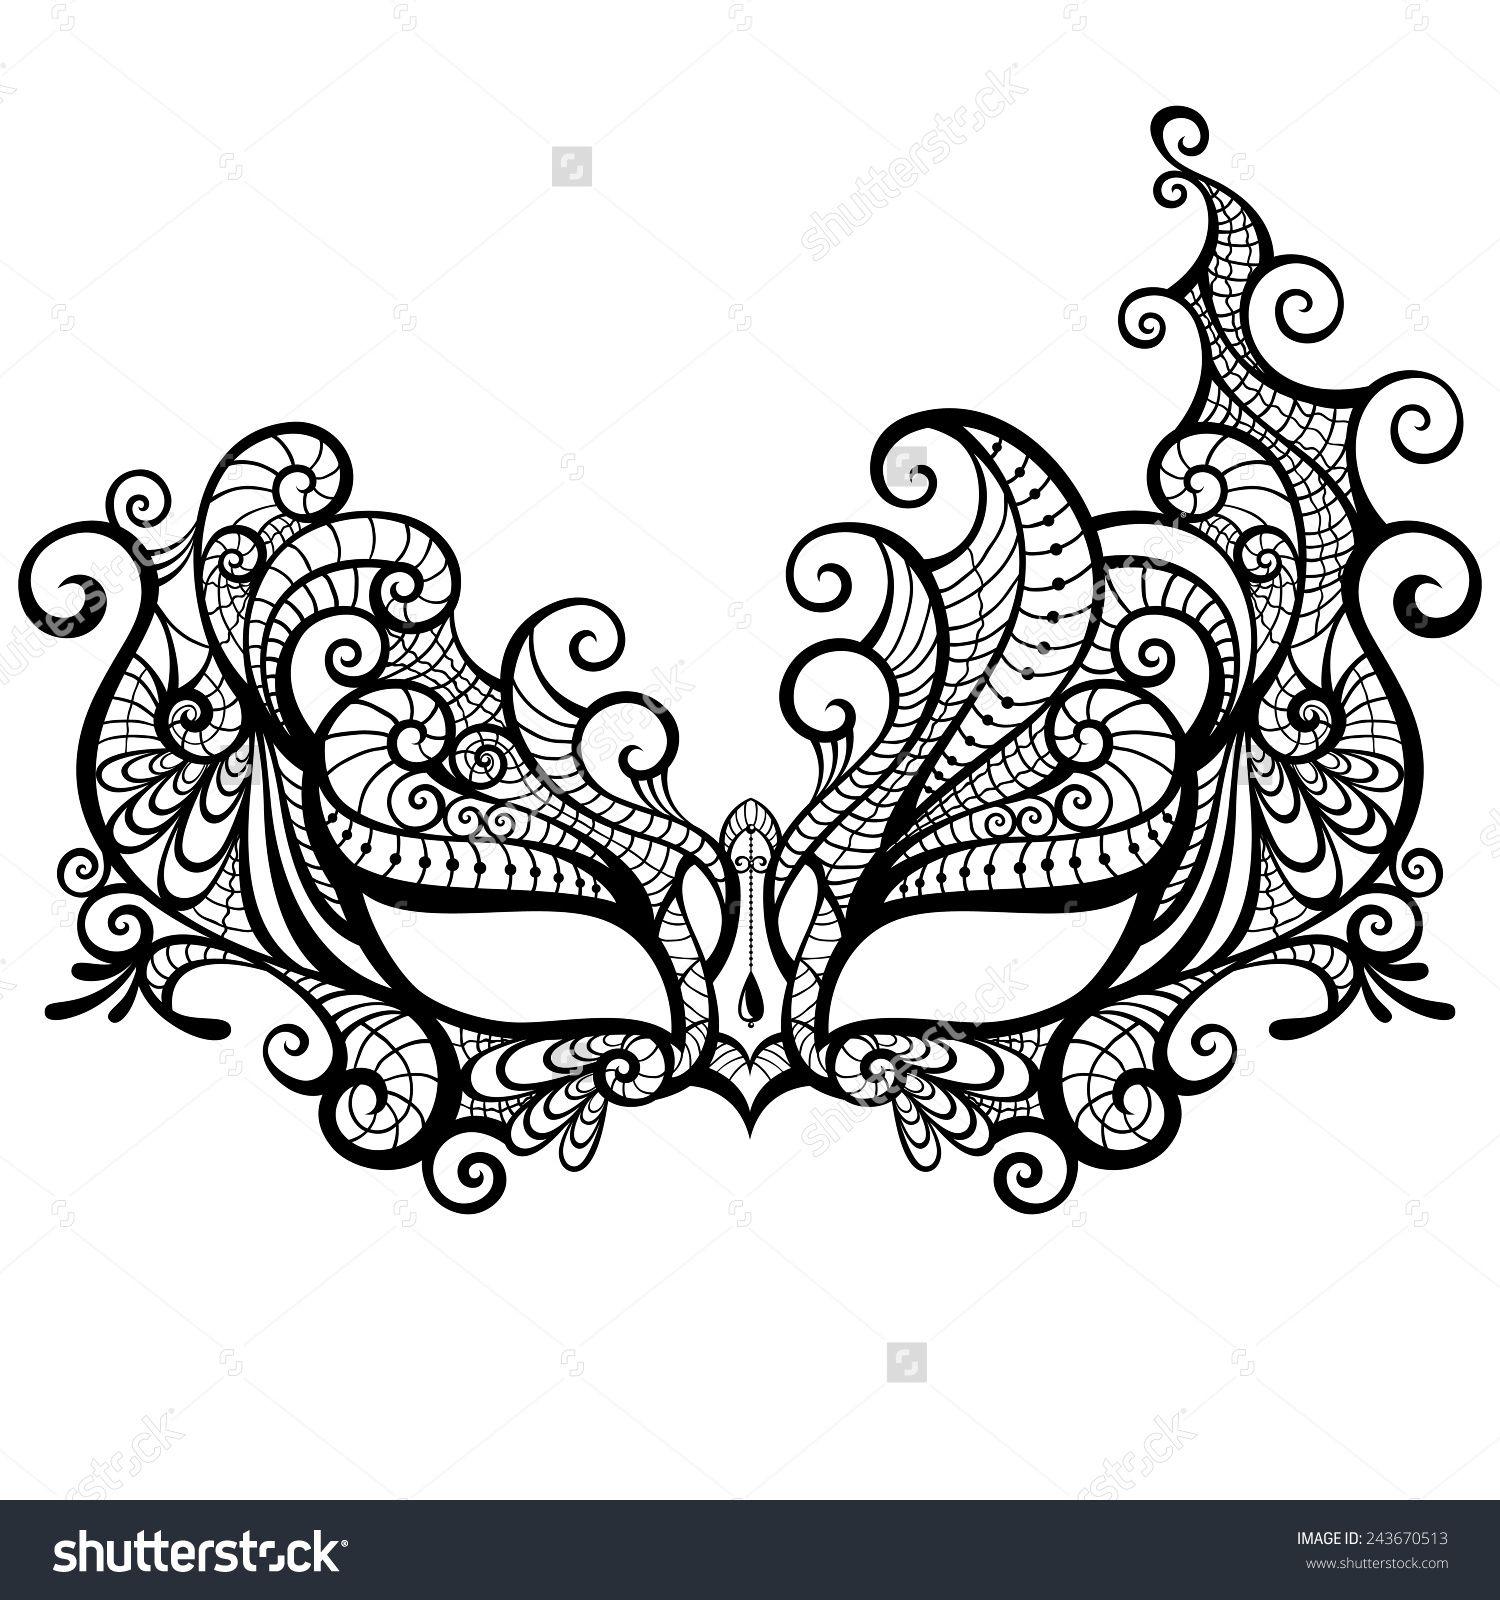 Pin by Valkiria on Mascaras Pinterest Lace masquerade